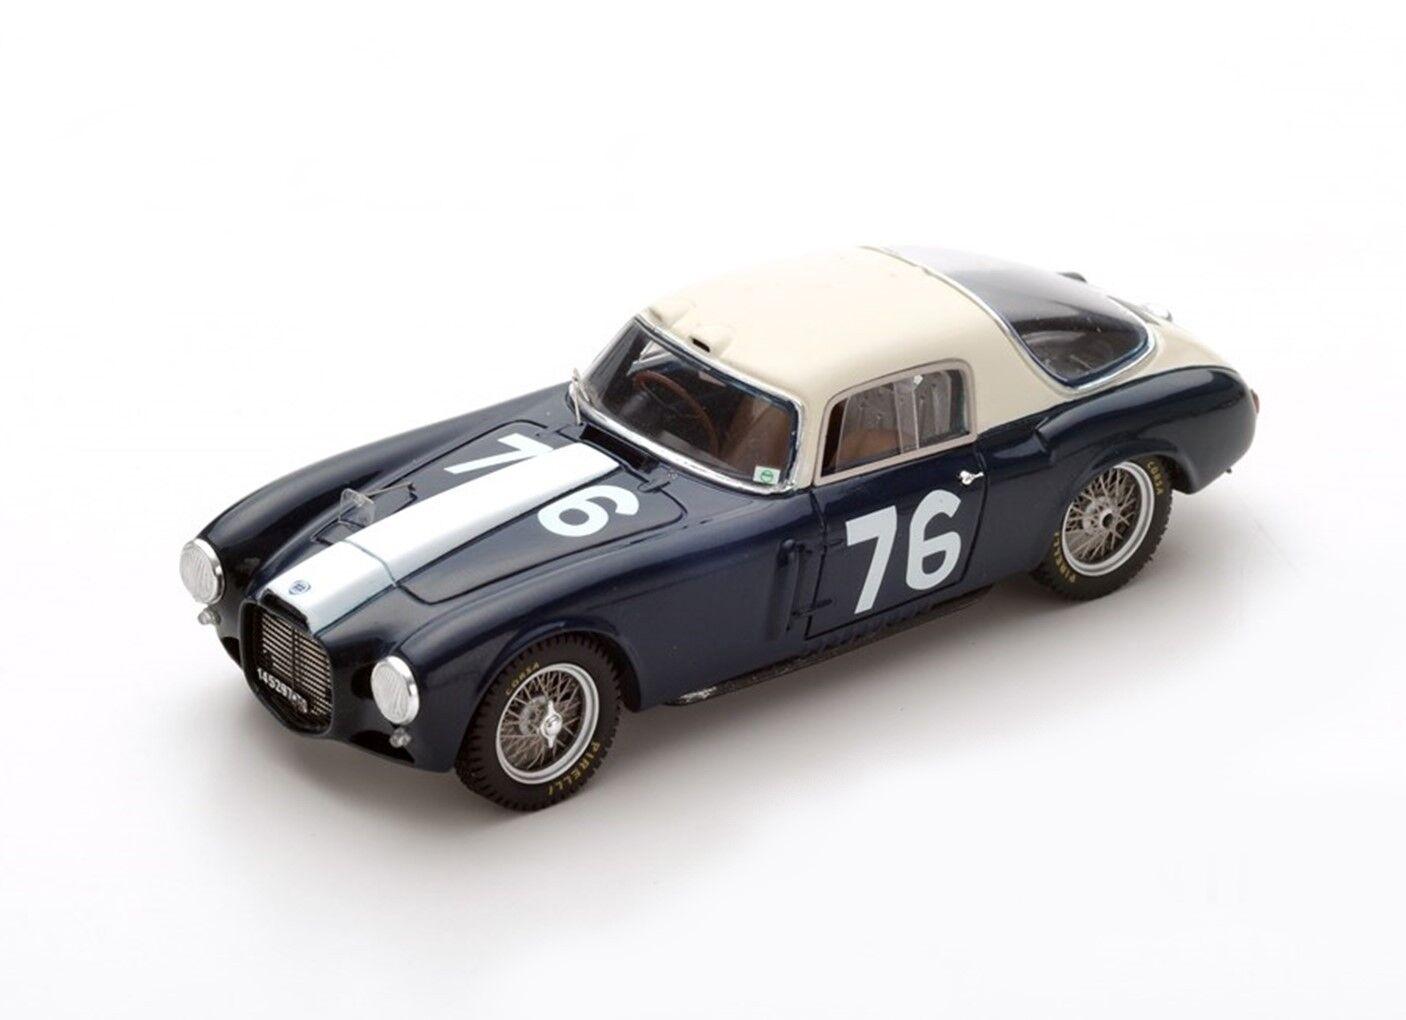 SPARK Lancia D20  76 Winner Targa Florio 1953 Umberto Maglioli  43TF53 1 43